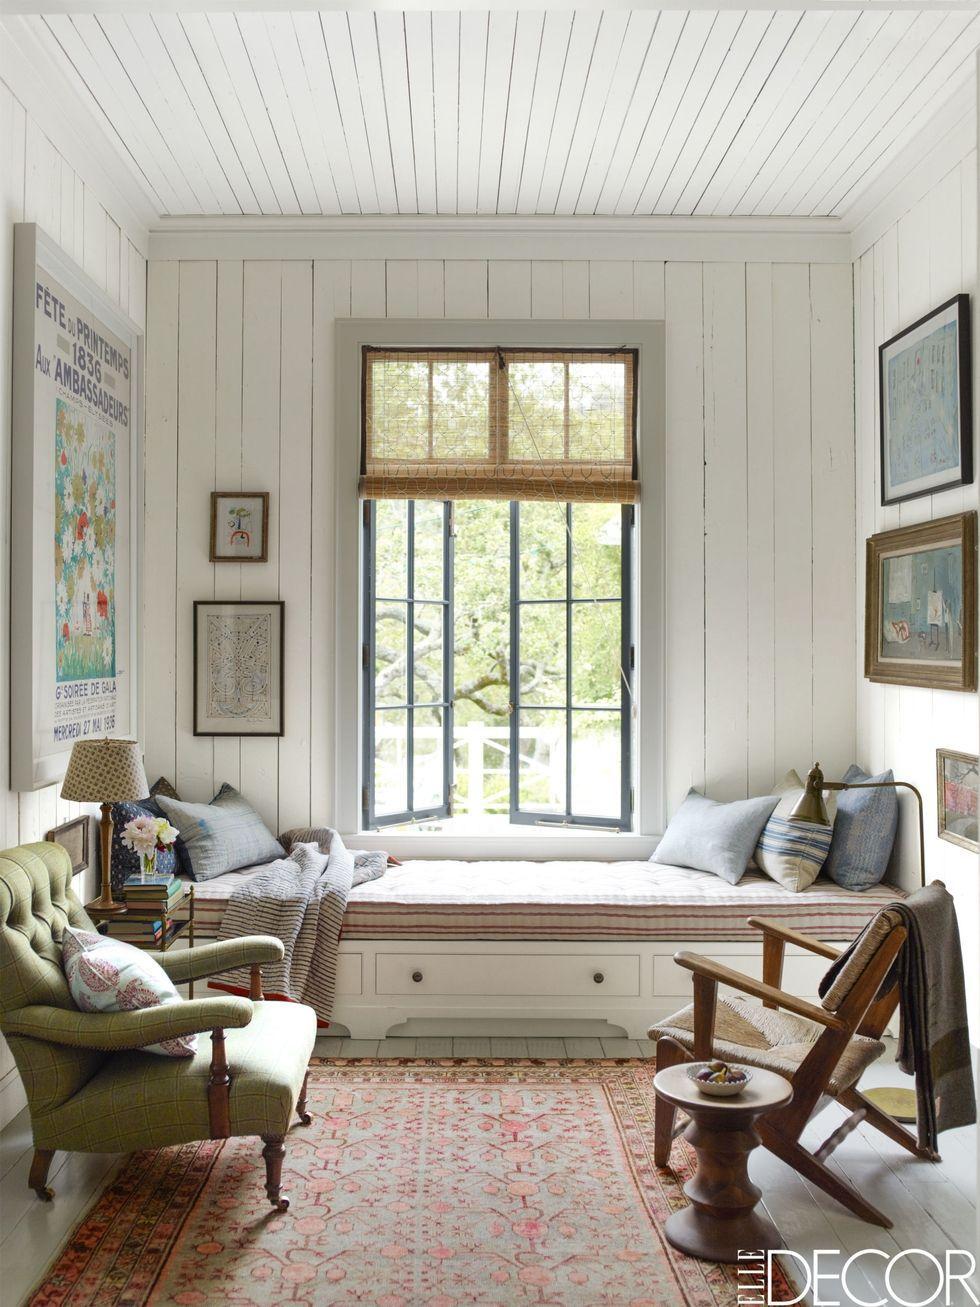 Best Small Living Room Design Ideas - Small Living Room Decor Inspiration